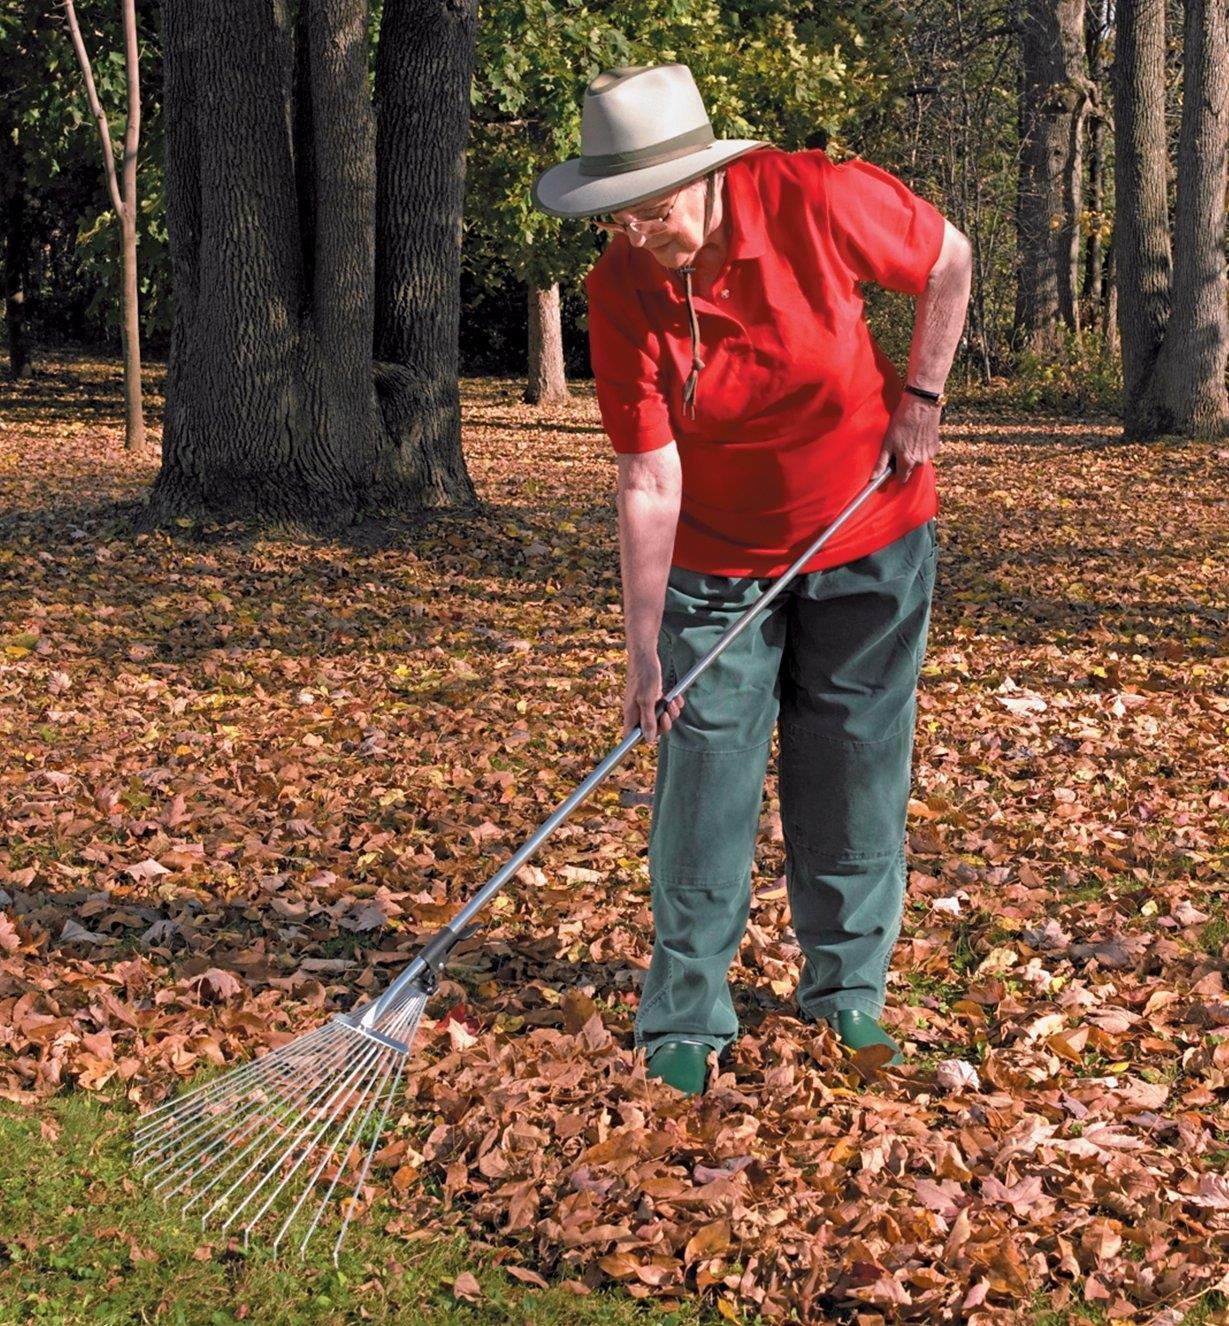 A woman rakes leaves using the Long-Handled Rake